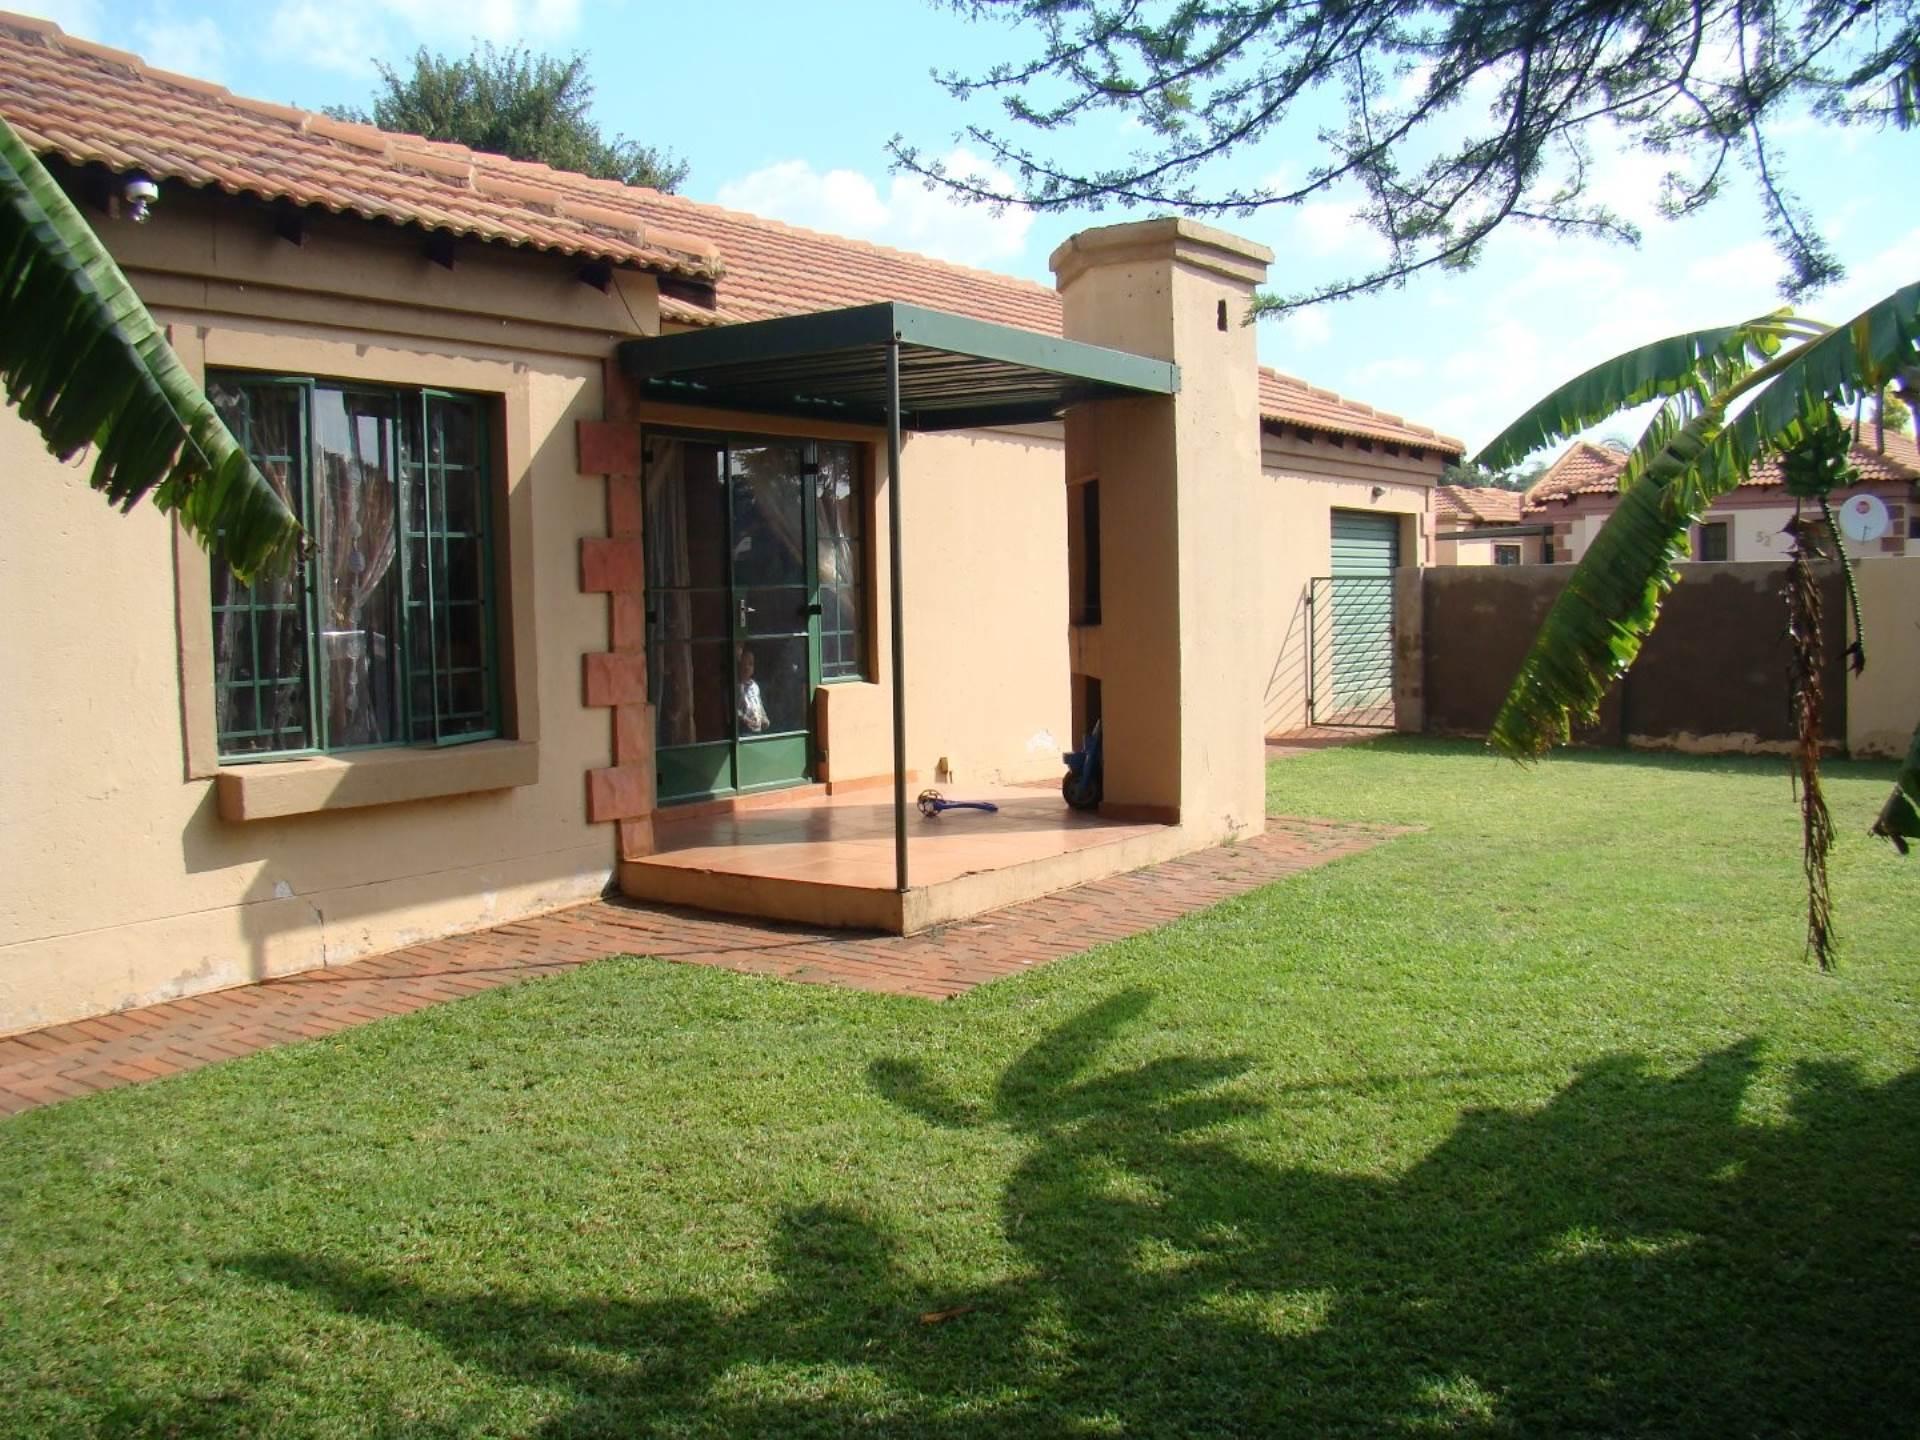 Akasia, Hesteapark Property  | Houses For Sale Hesteapark, HESTEAPARK, House 3 bedrooms property for sale Price:900,000